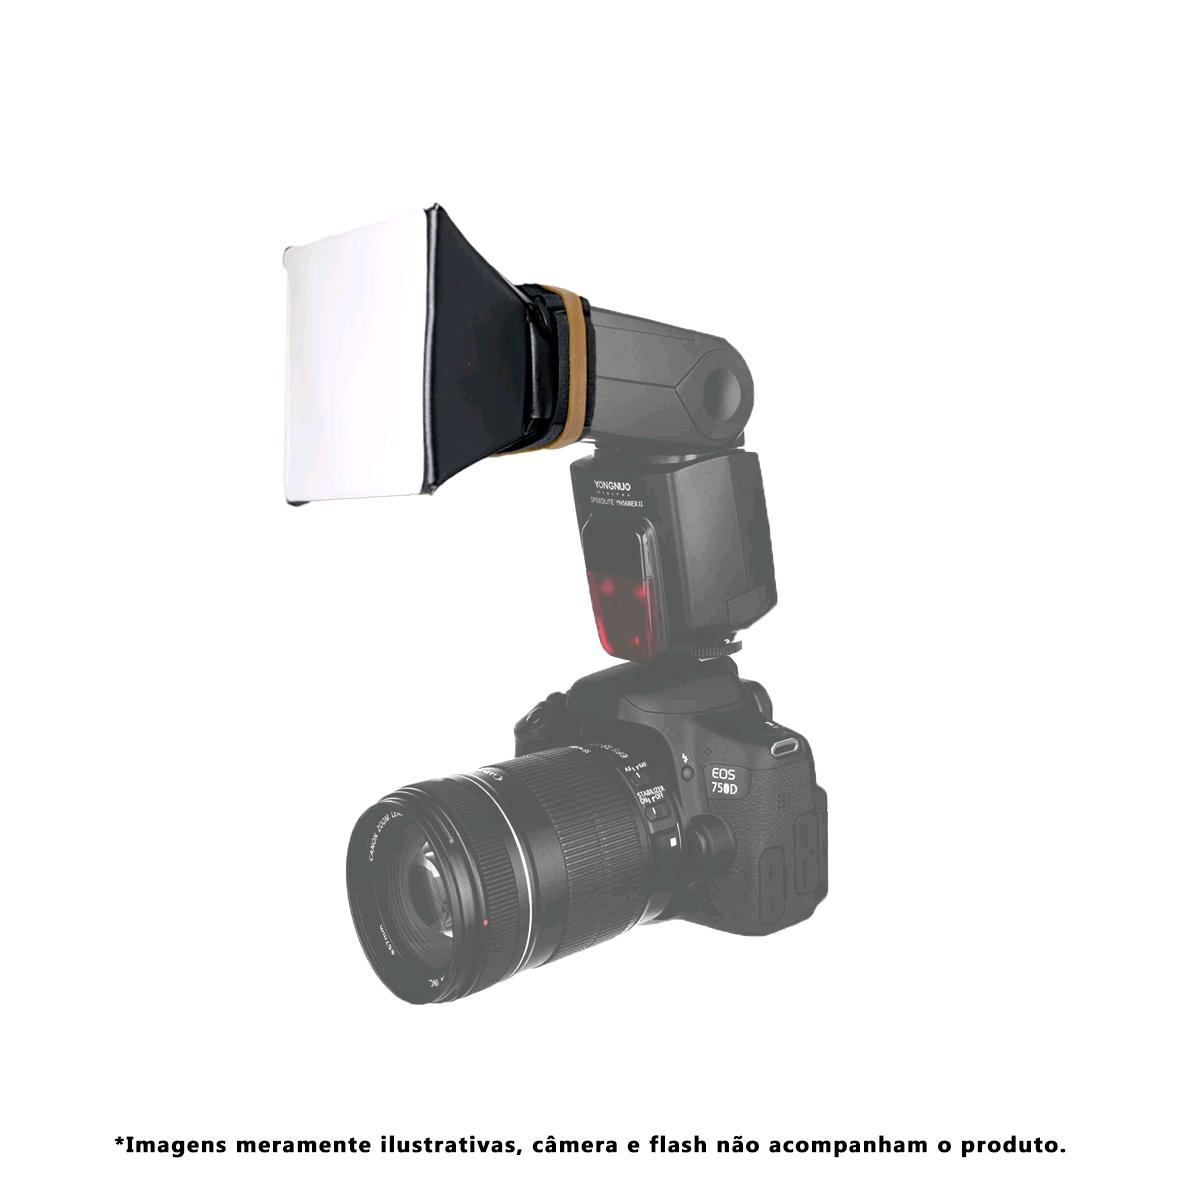 Lote com 10 unidades de Mini Softbox Difusor para Flash Speedlite Sou Foto MSF-001  - Fotolux